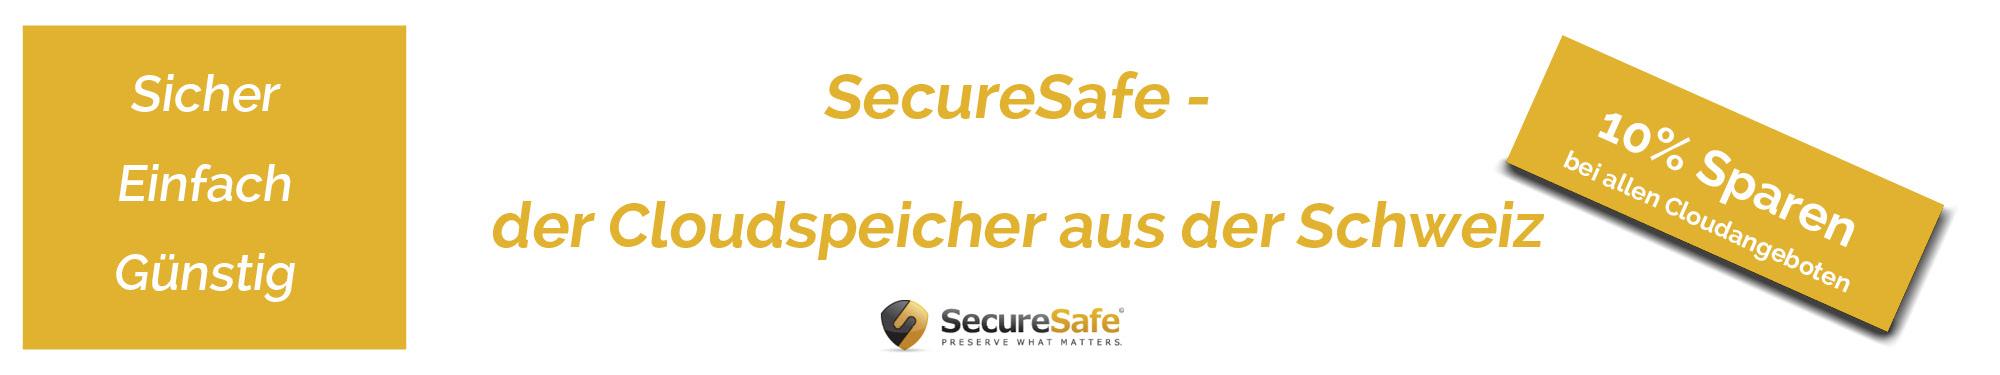 SecureSafe - sichererer Cloudspeicher